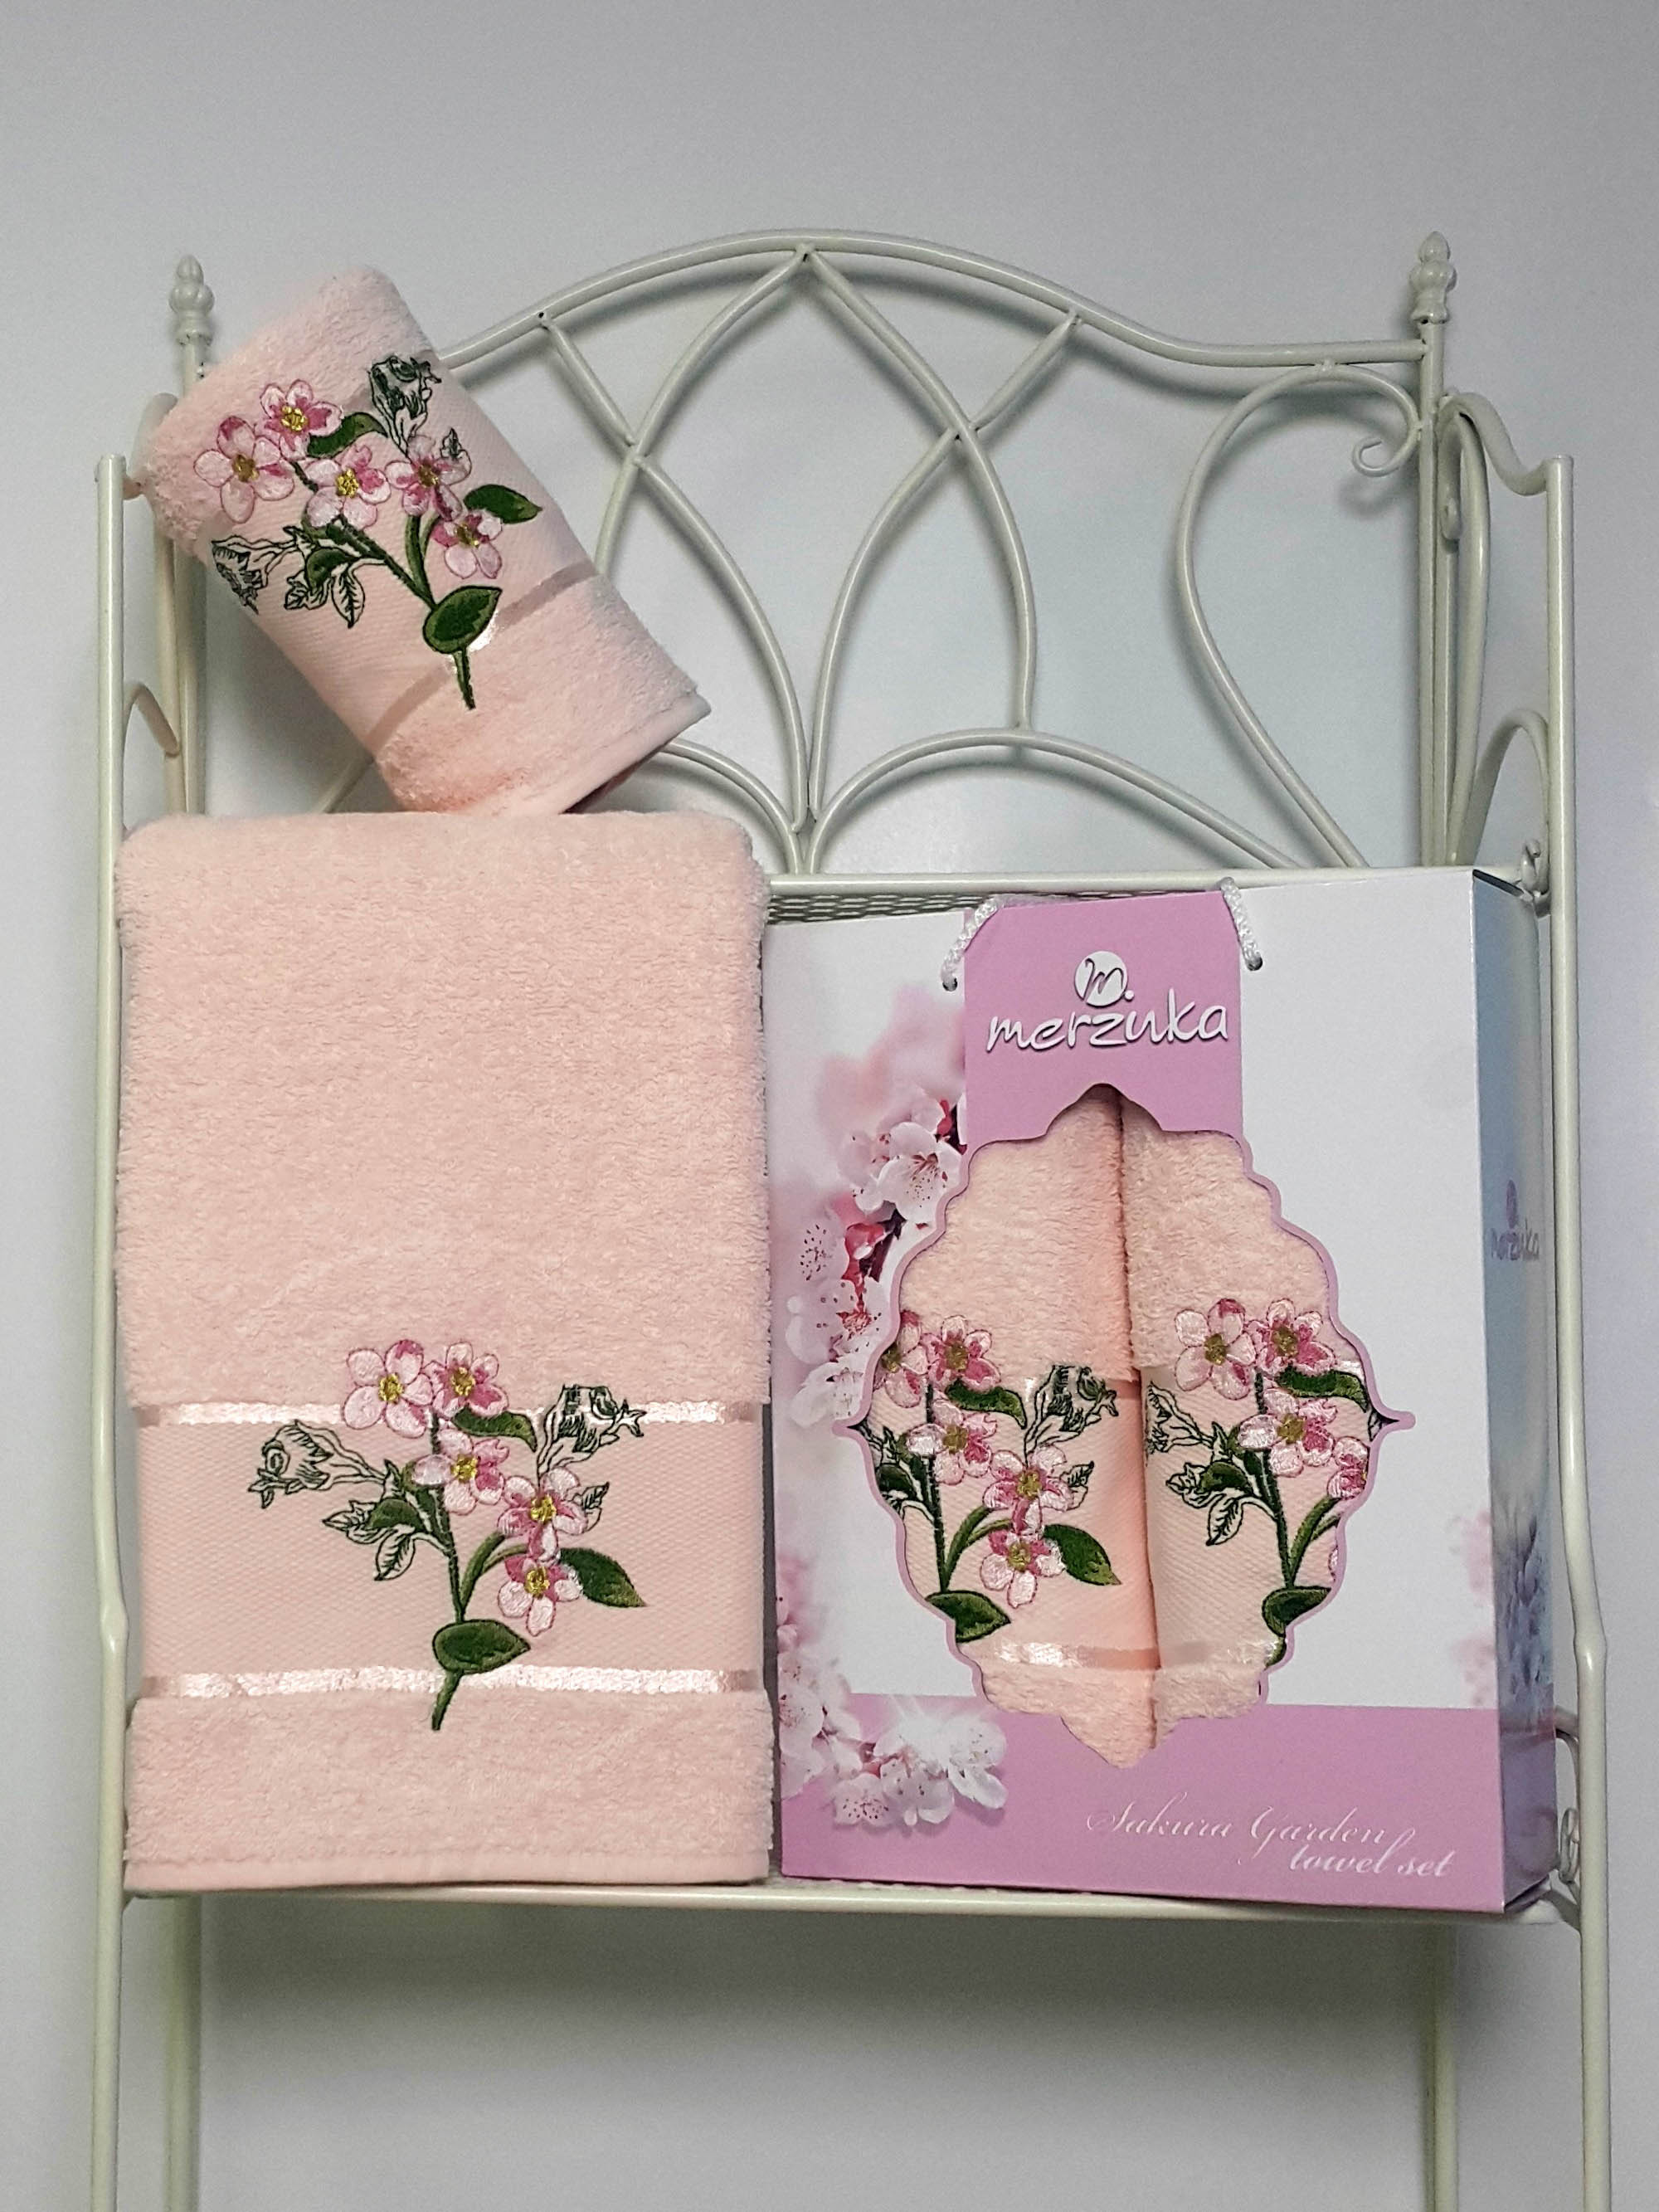 Полотенца Oran Merzuka Набор из 2 полотенец Sakura Garden Цвет: Пудра набор из 3 полотенец merzuka sakura 50х90 2 70х140 8432 оранжевый